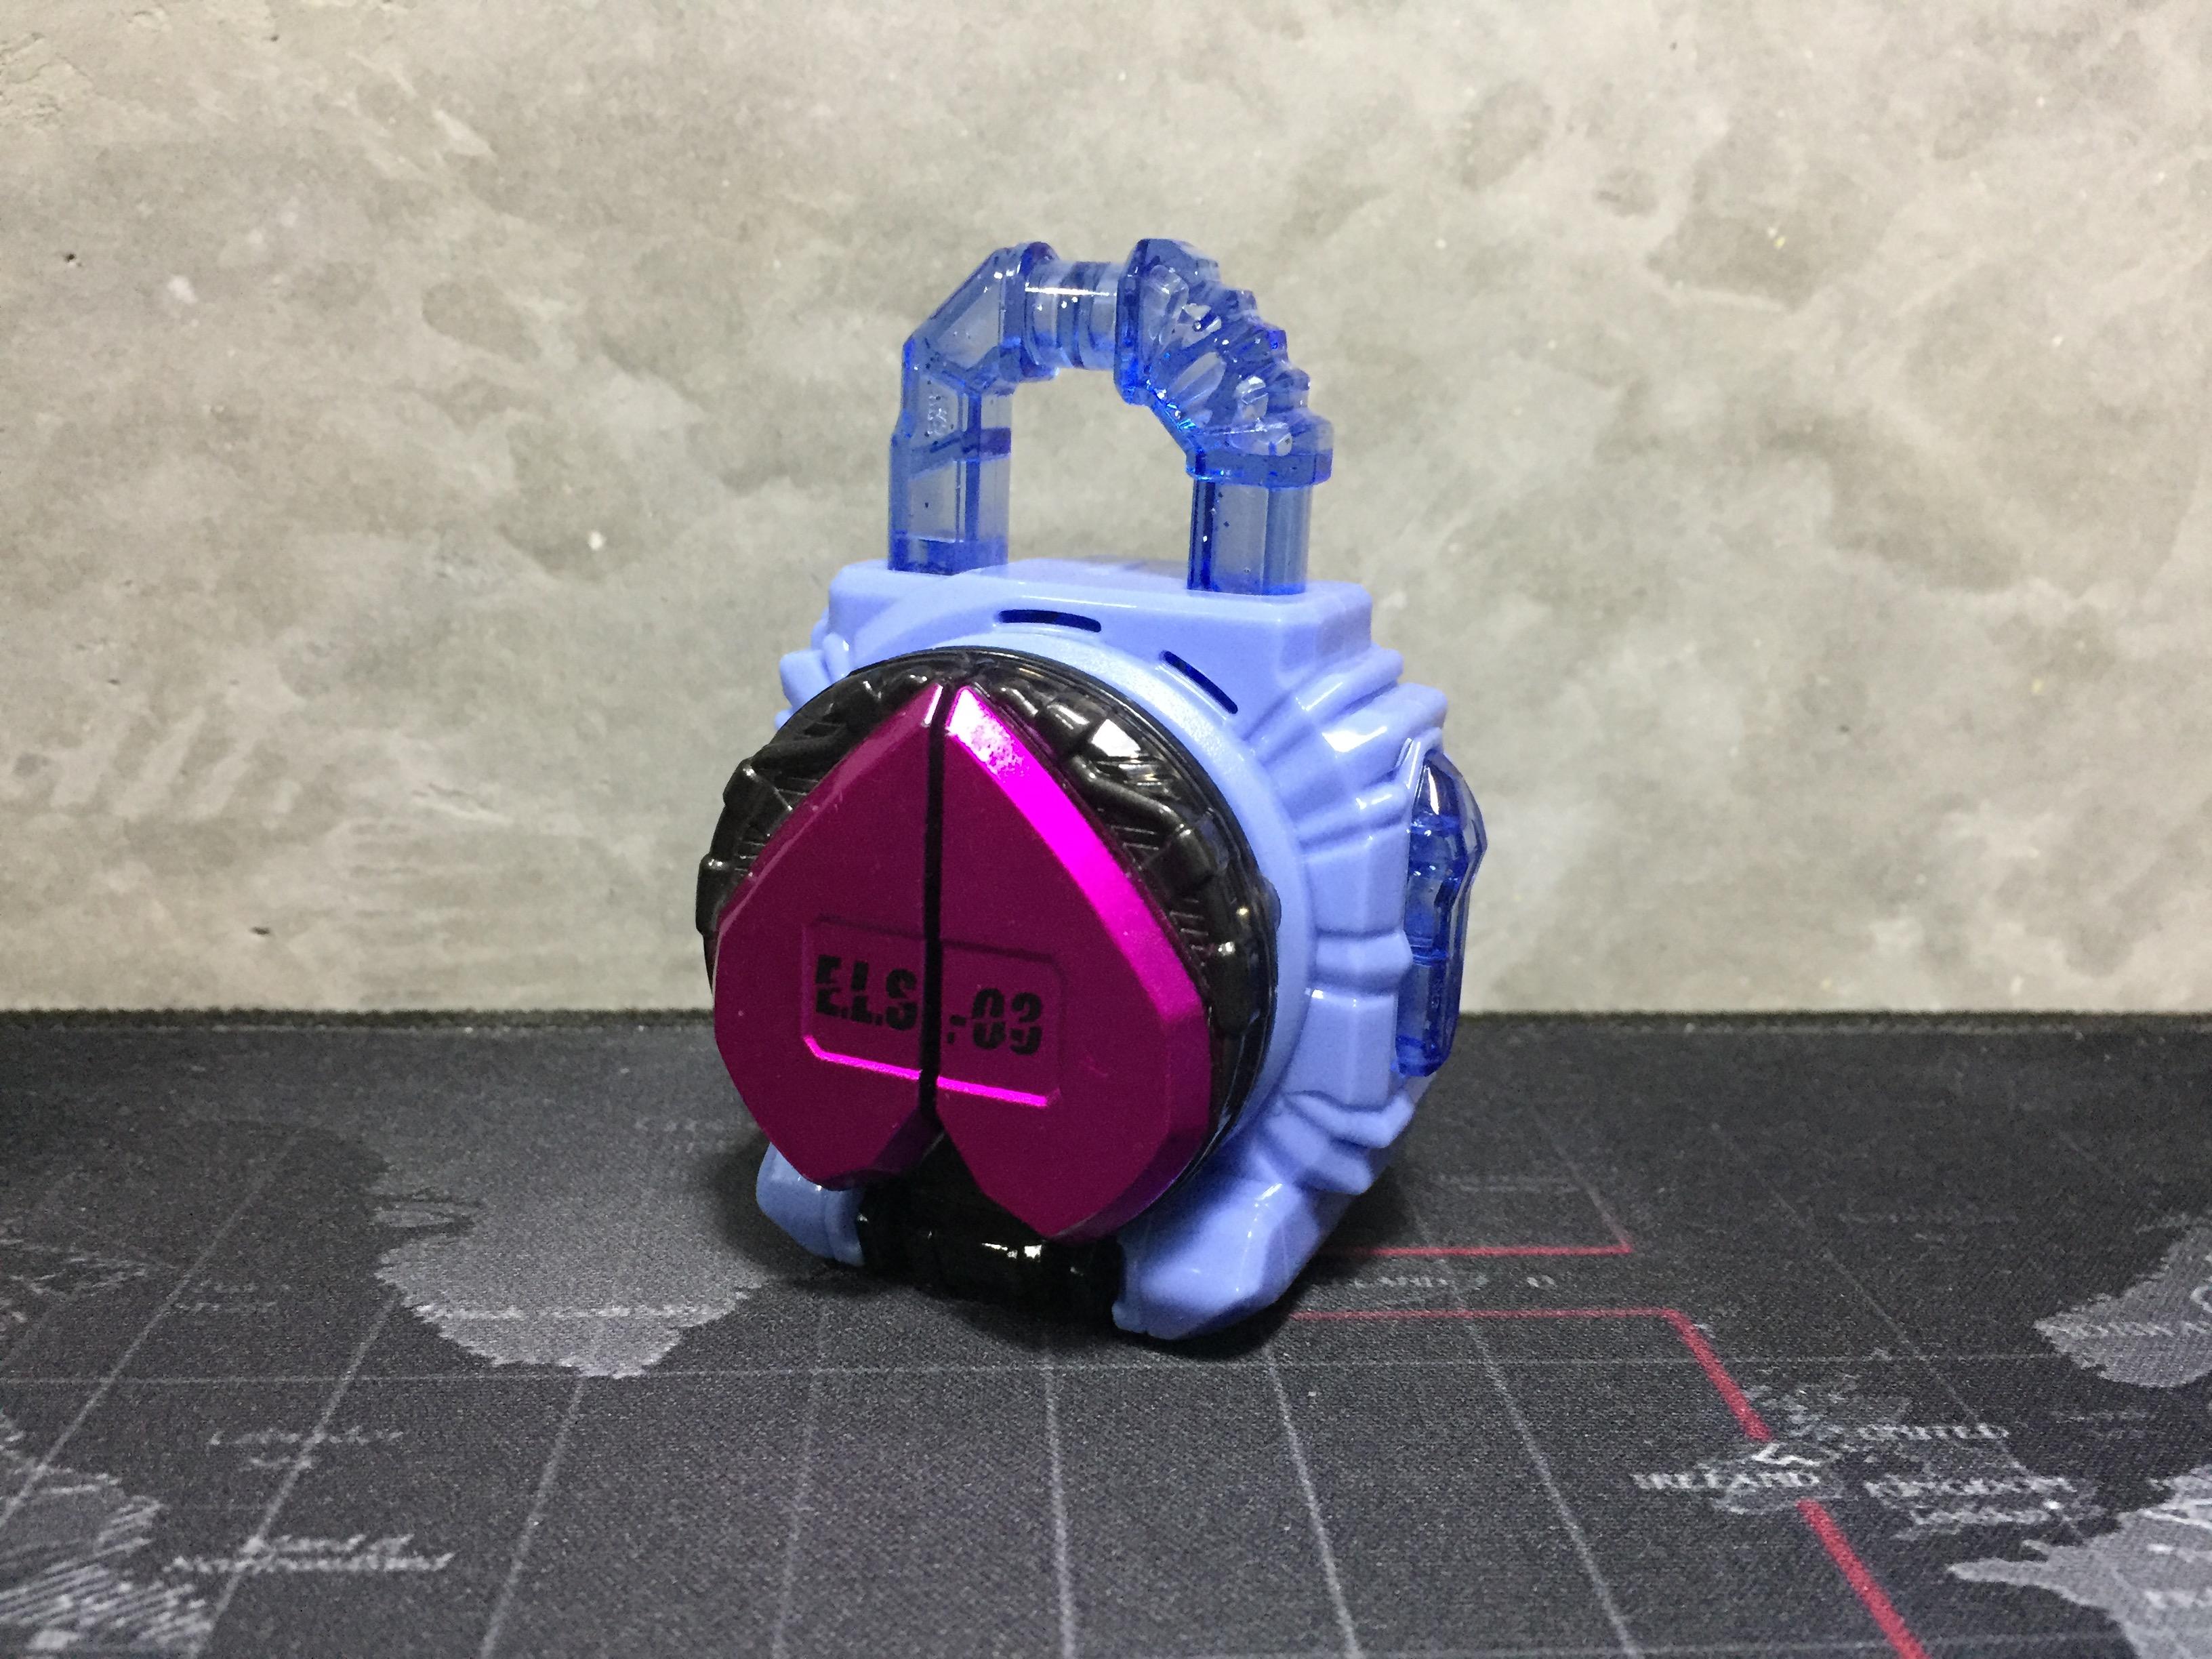 Kamen Rider Gaim Gashapon ELS-03 Peach Energy Lock Seed (พีช)